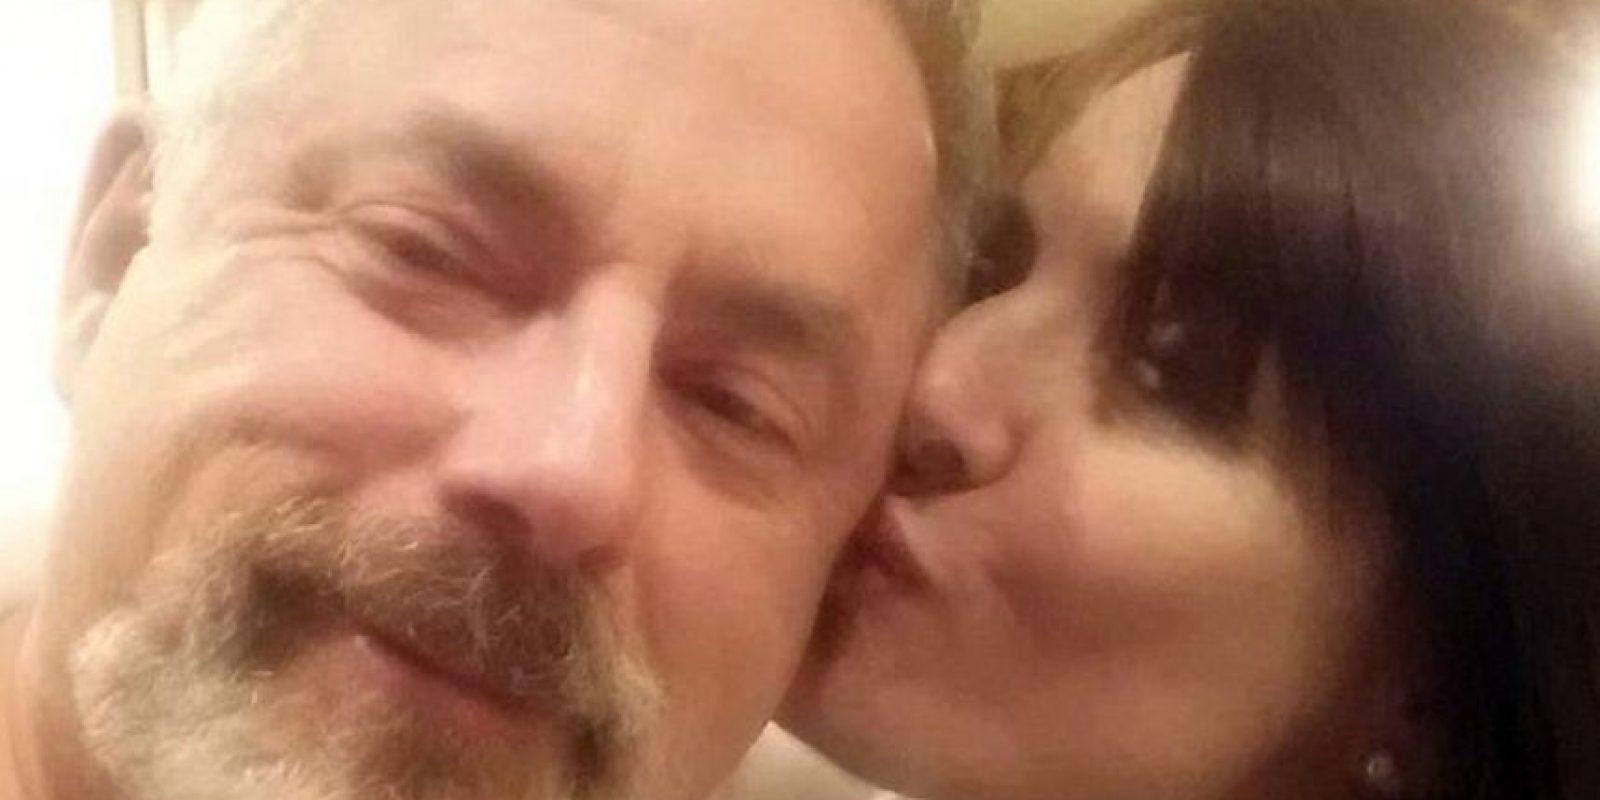 Scott Samson le dio un final de tragedia a su boda. Foto:Facebook